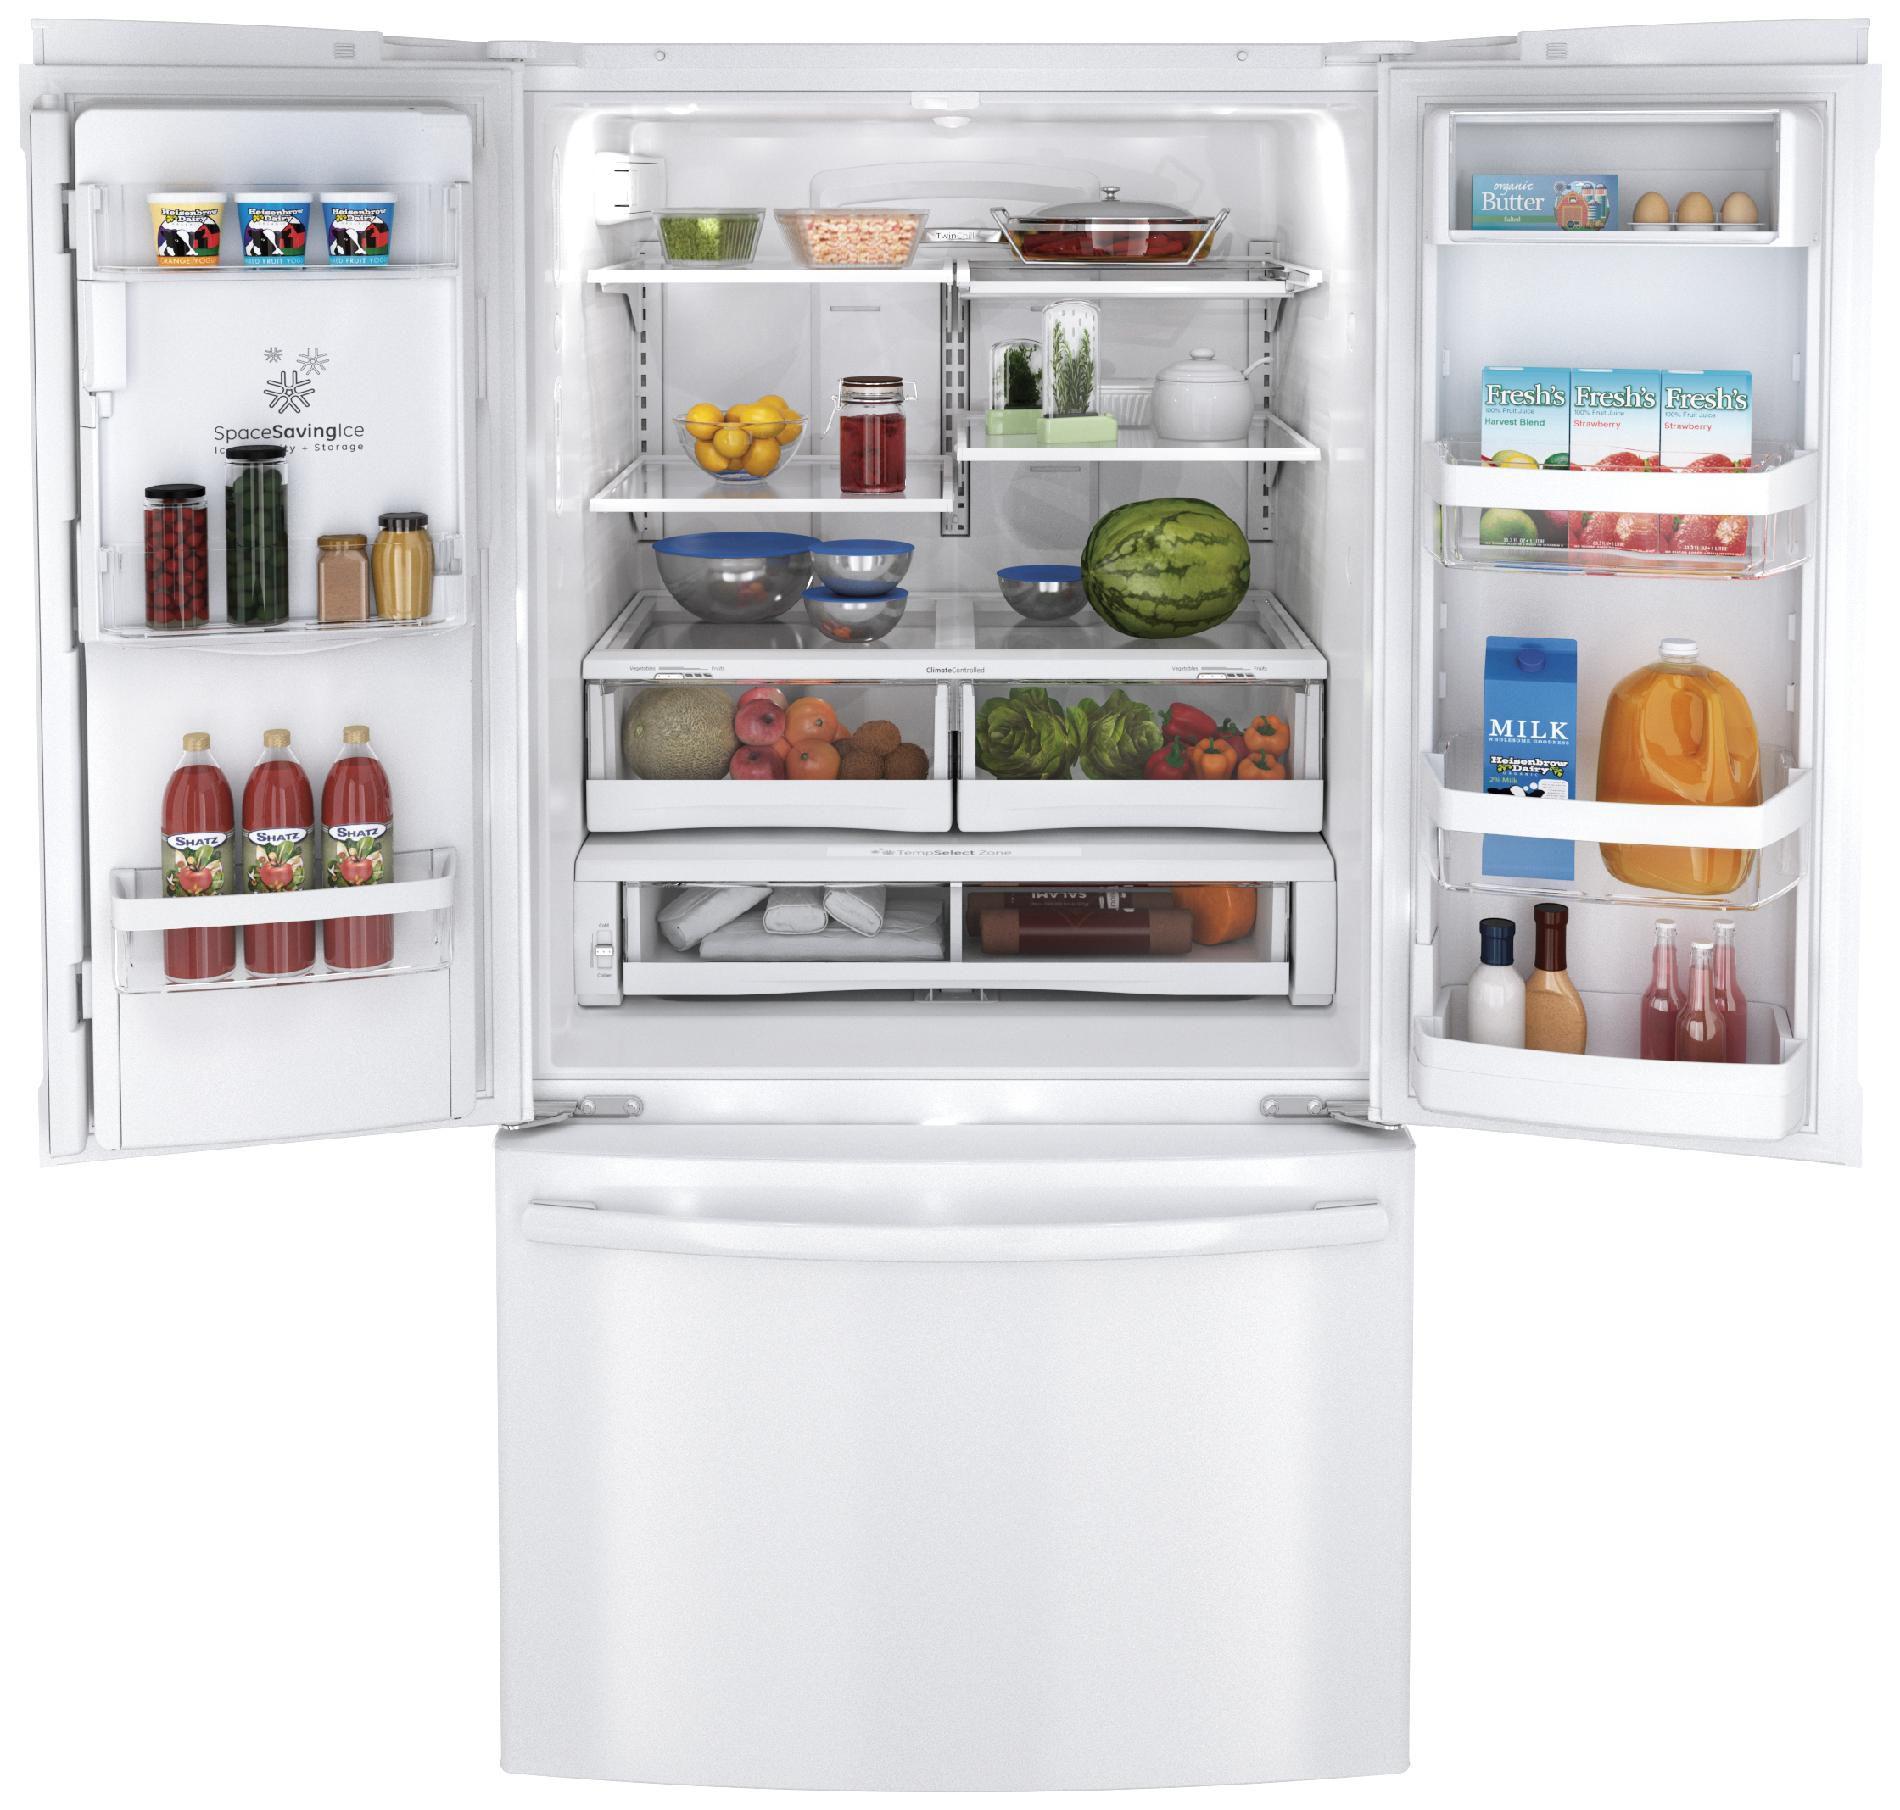 GE 28.6 cu. ft. French Door Refrigerators - White